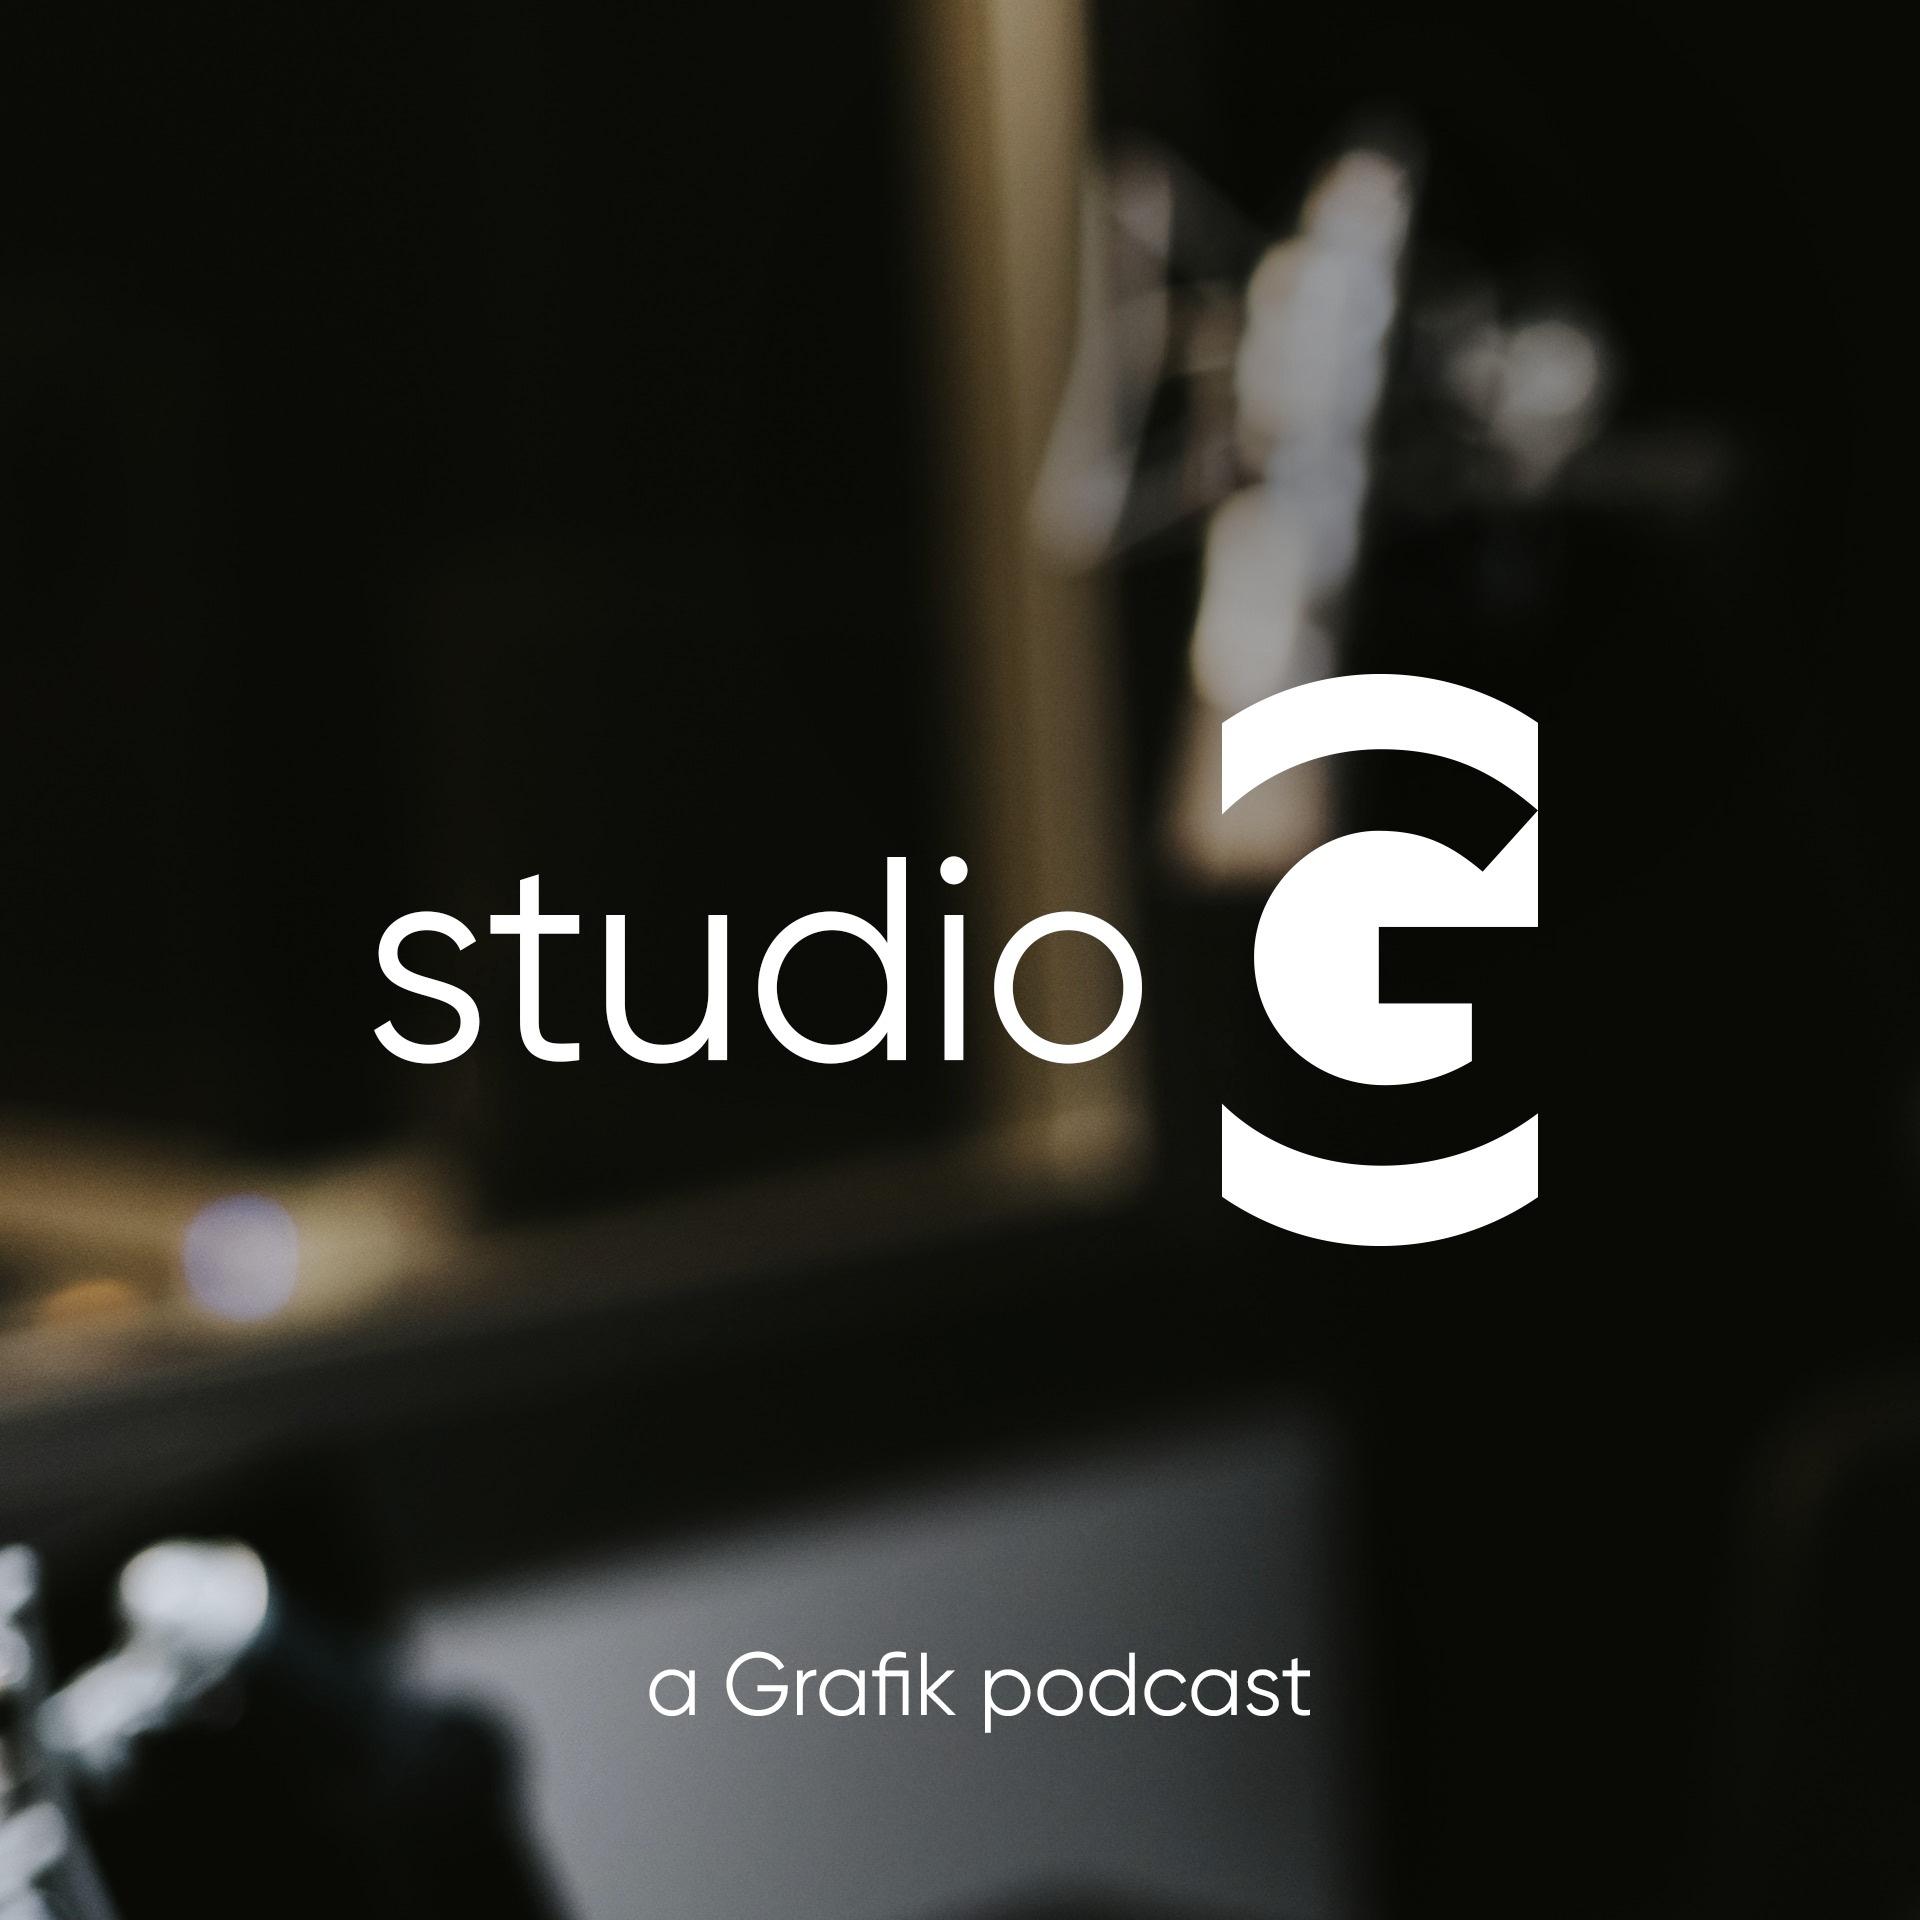 Introducing Studio G